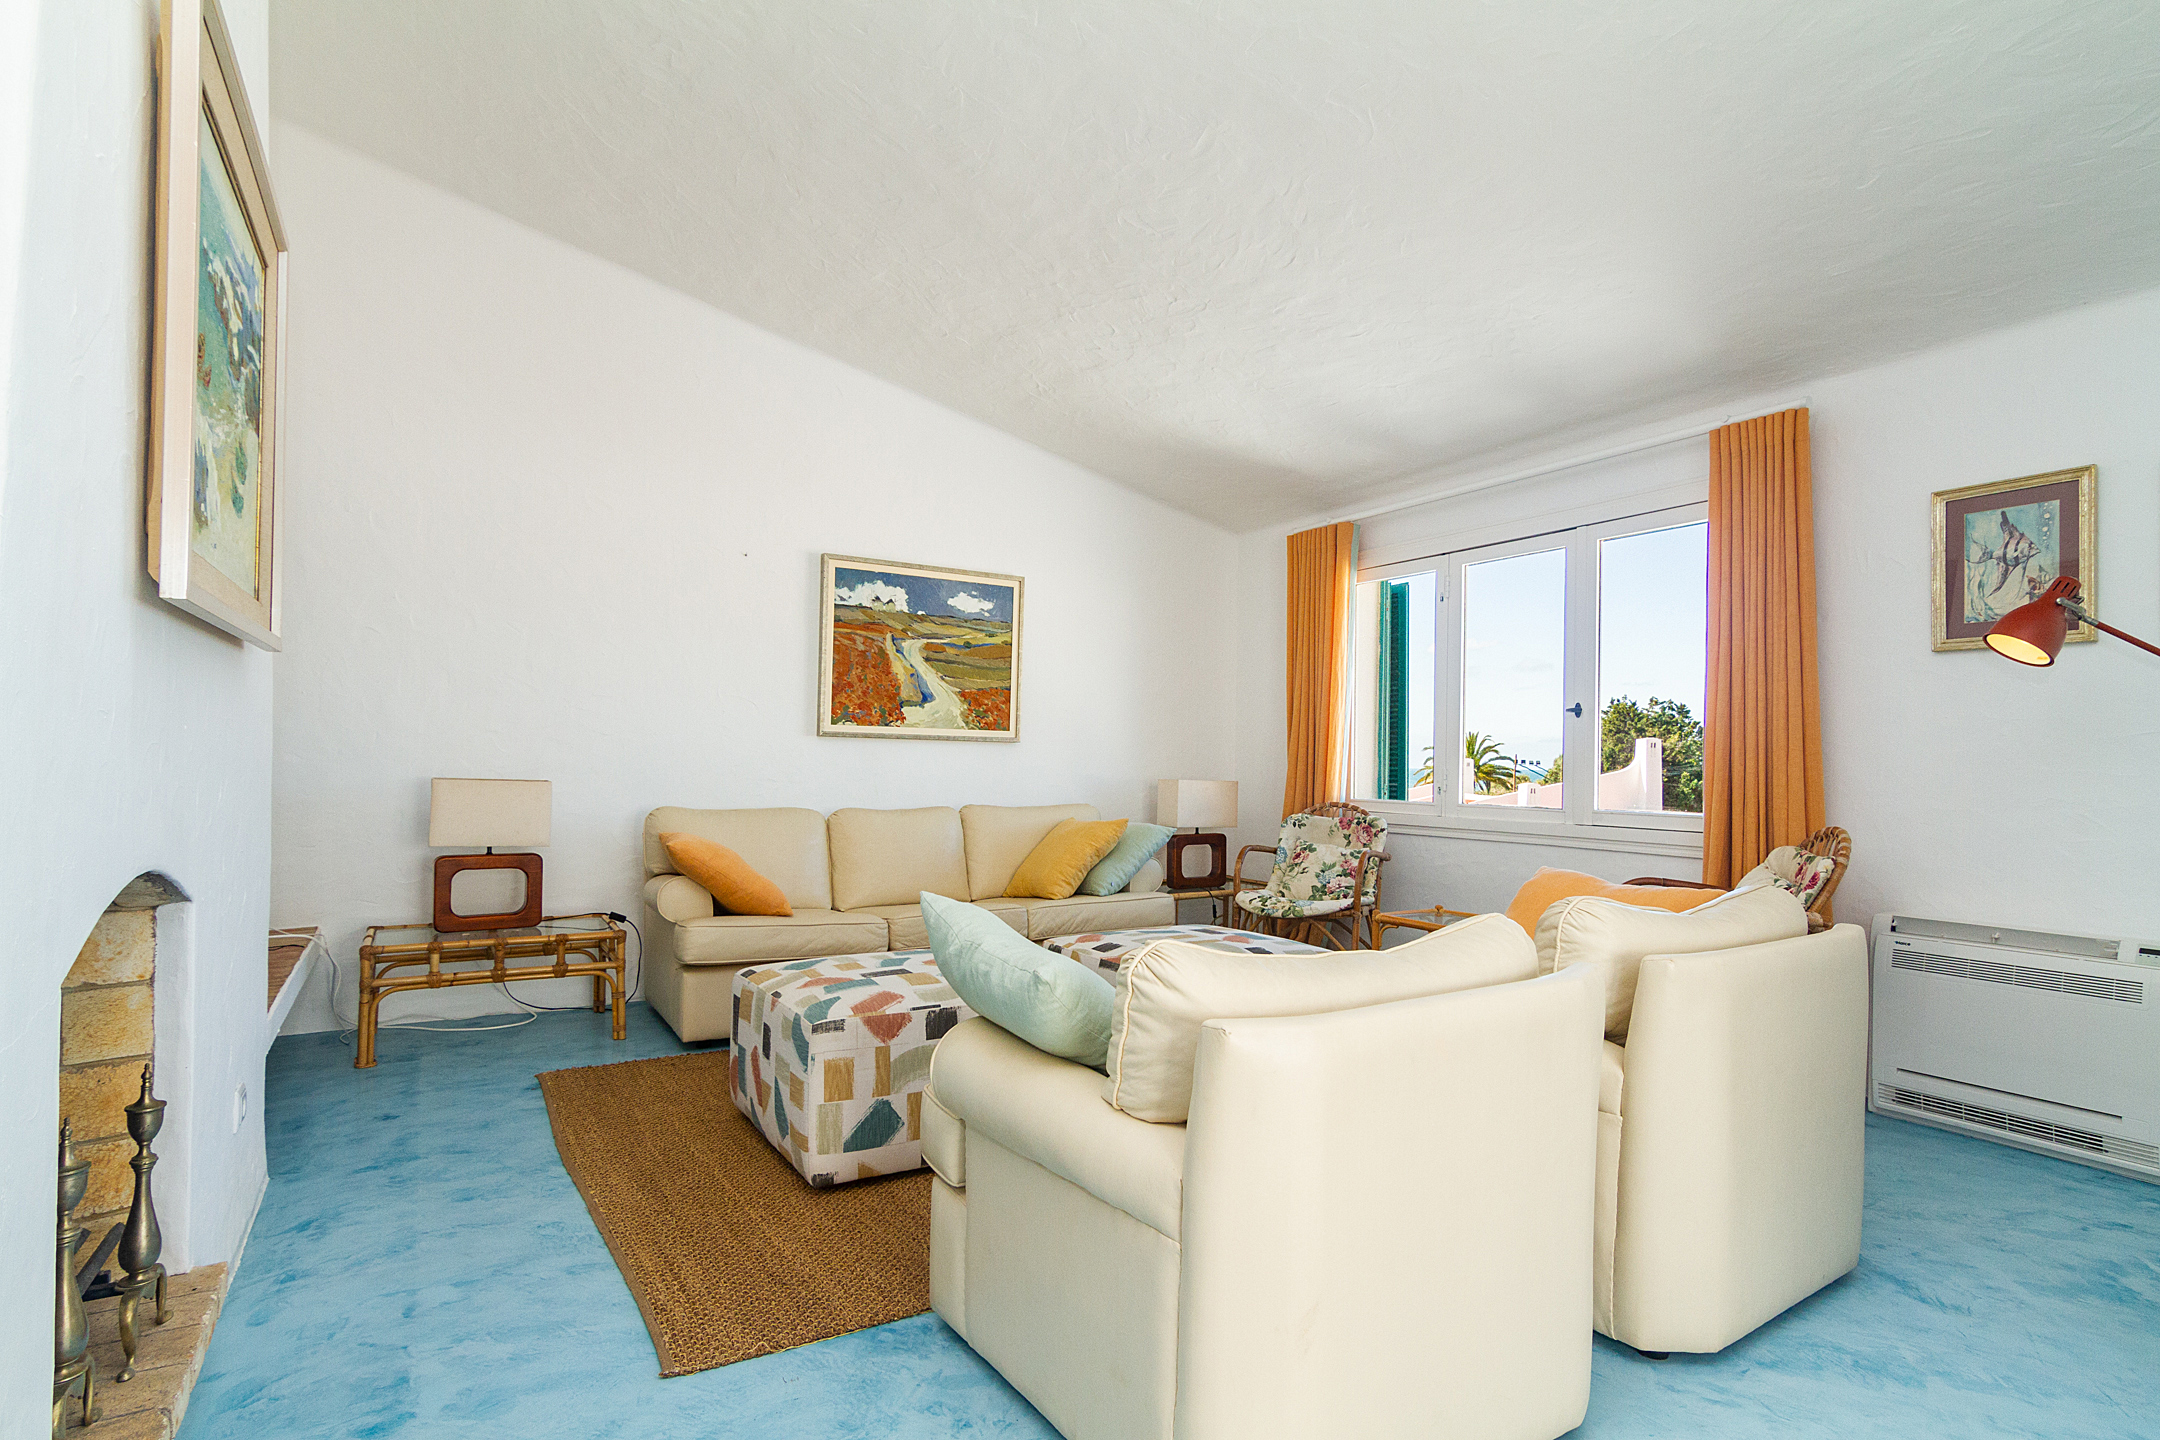 Location appartements et villas de vacance, Liiiving in Algarve | Alvor Blue Villa à Alvor, Portugal Algarve, REF_IMG_14545_14557